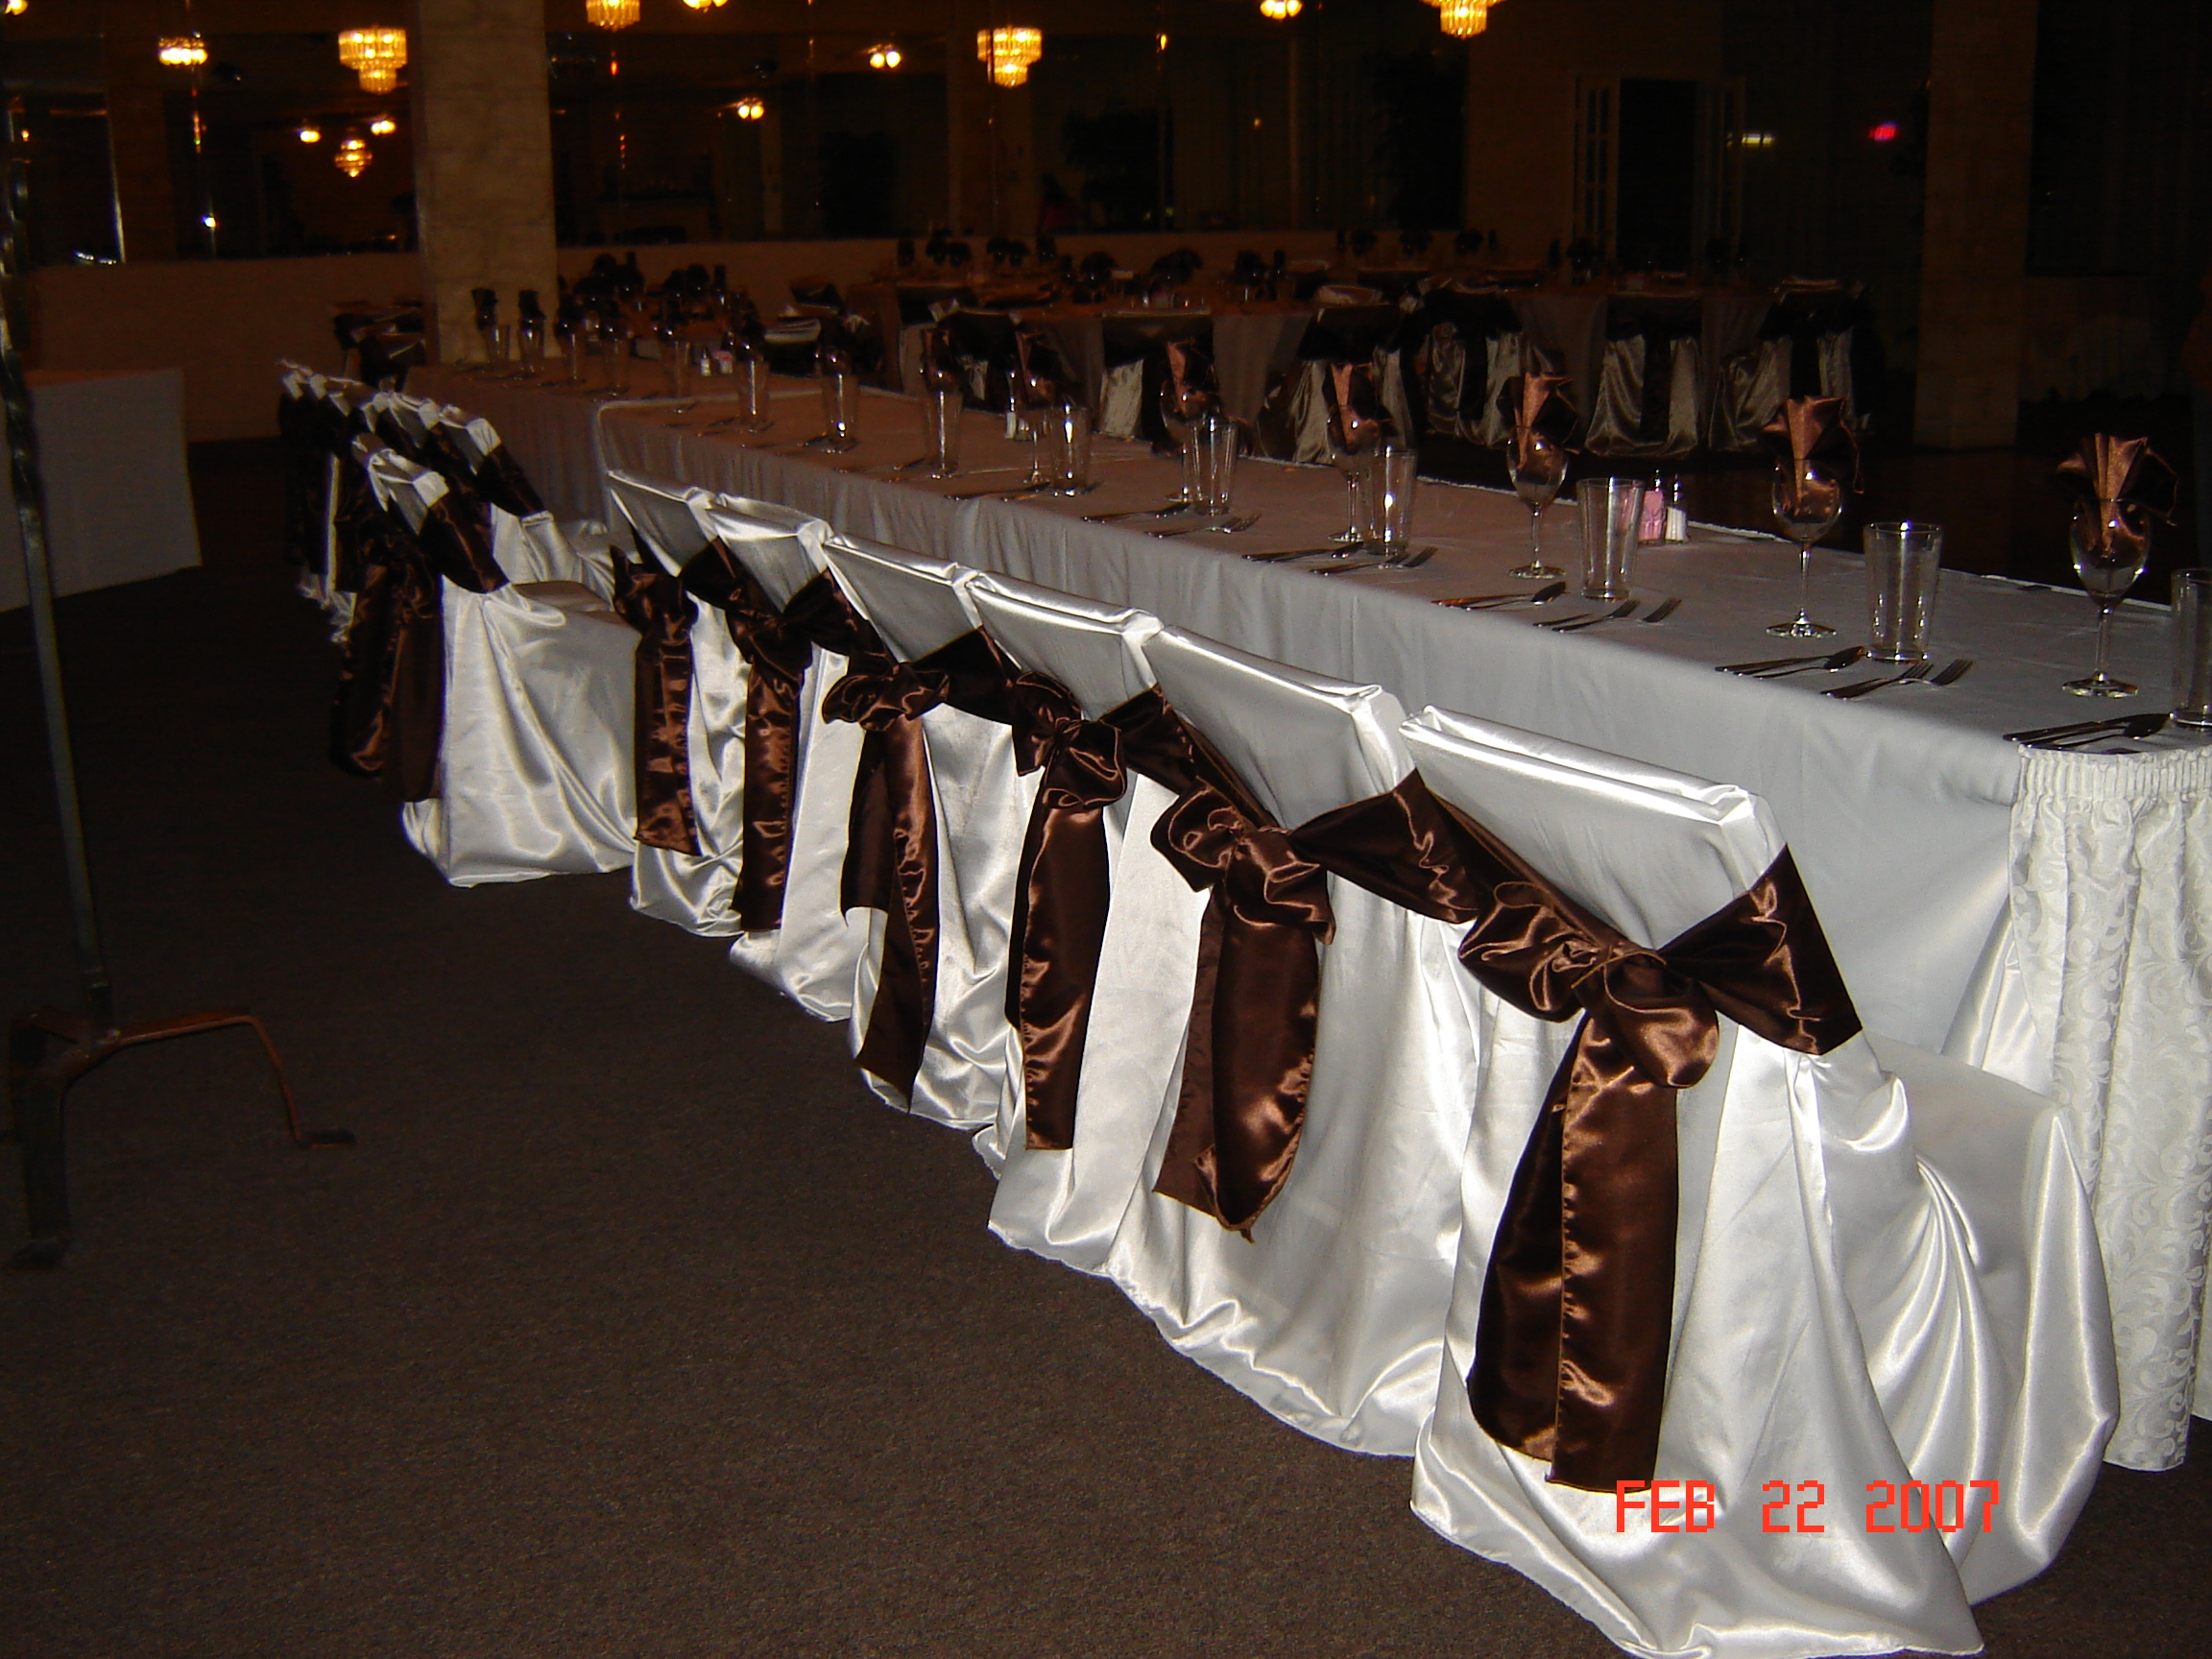 Simply Elegant Weddings Chair Cover Rentals wedding rentals